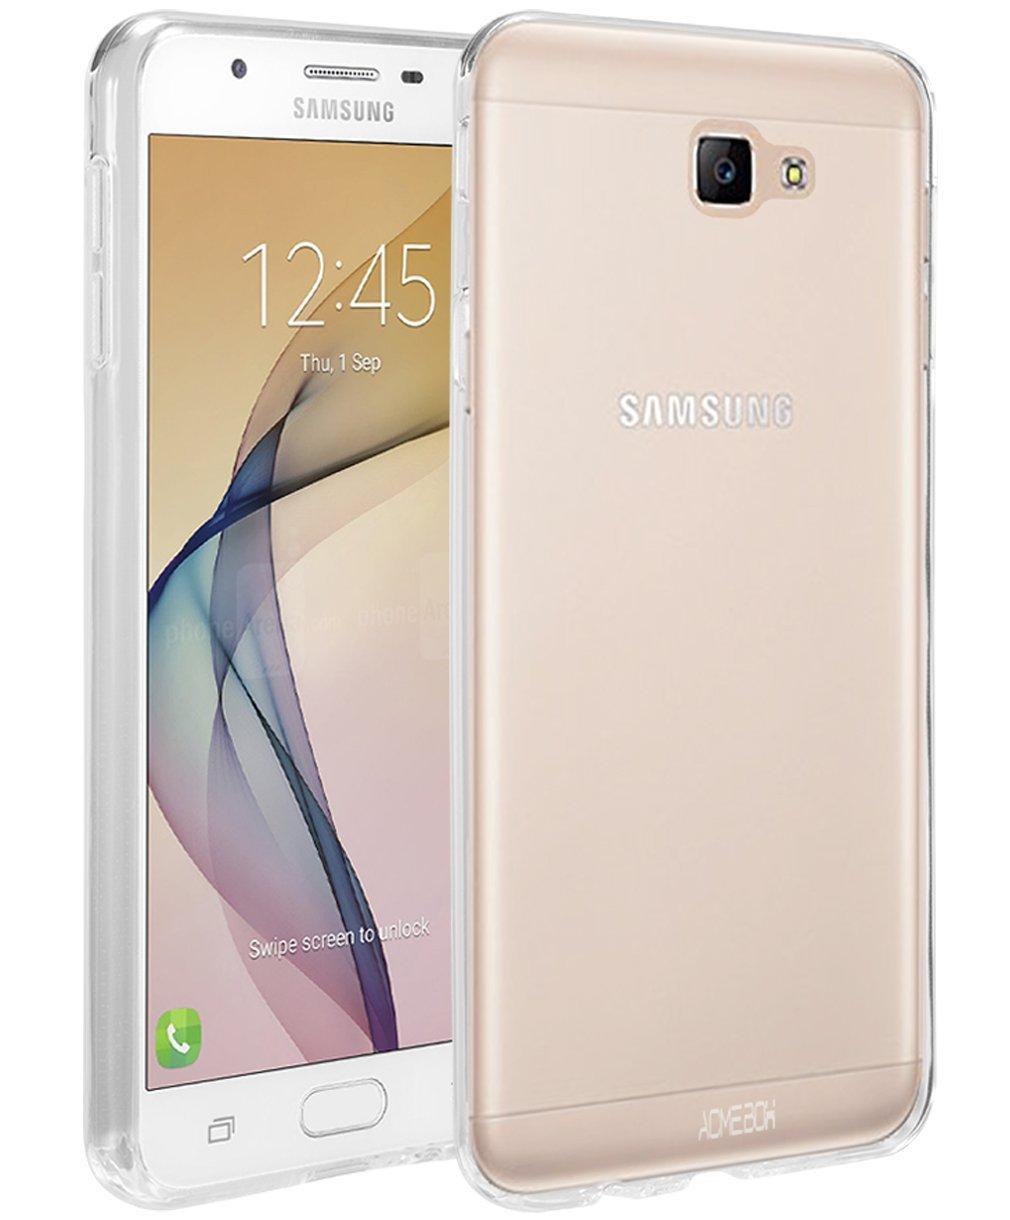 36c0b6e8a14 BOX [Anti-Shock] TPU Gel Rubber Thin Flexible Soft Bumper Silicone  Protective Case Cover for Samsung J7 Prime/Galaxy On7 2016 G610 - Clear in  Cheap ...